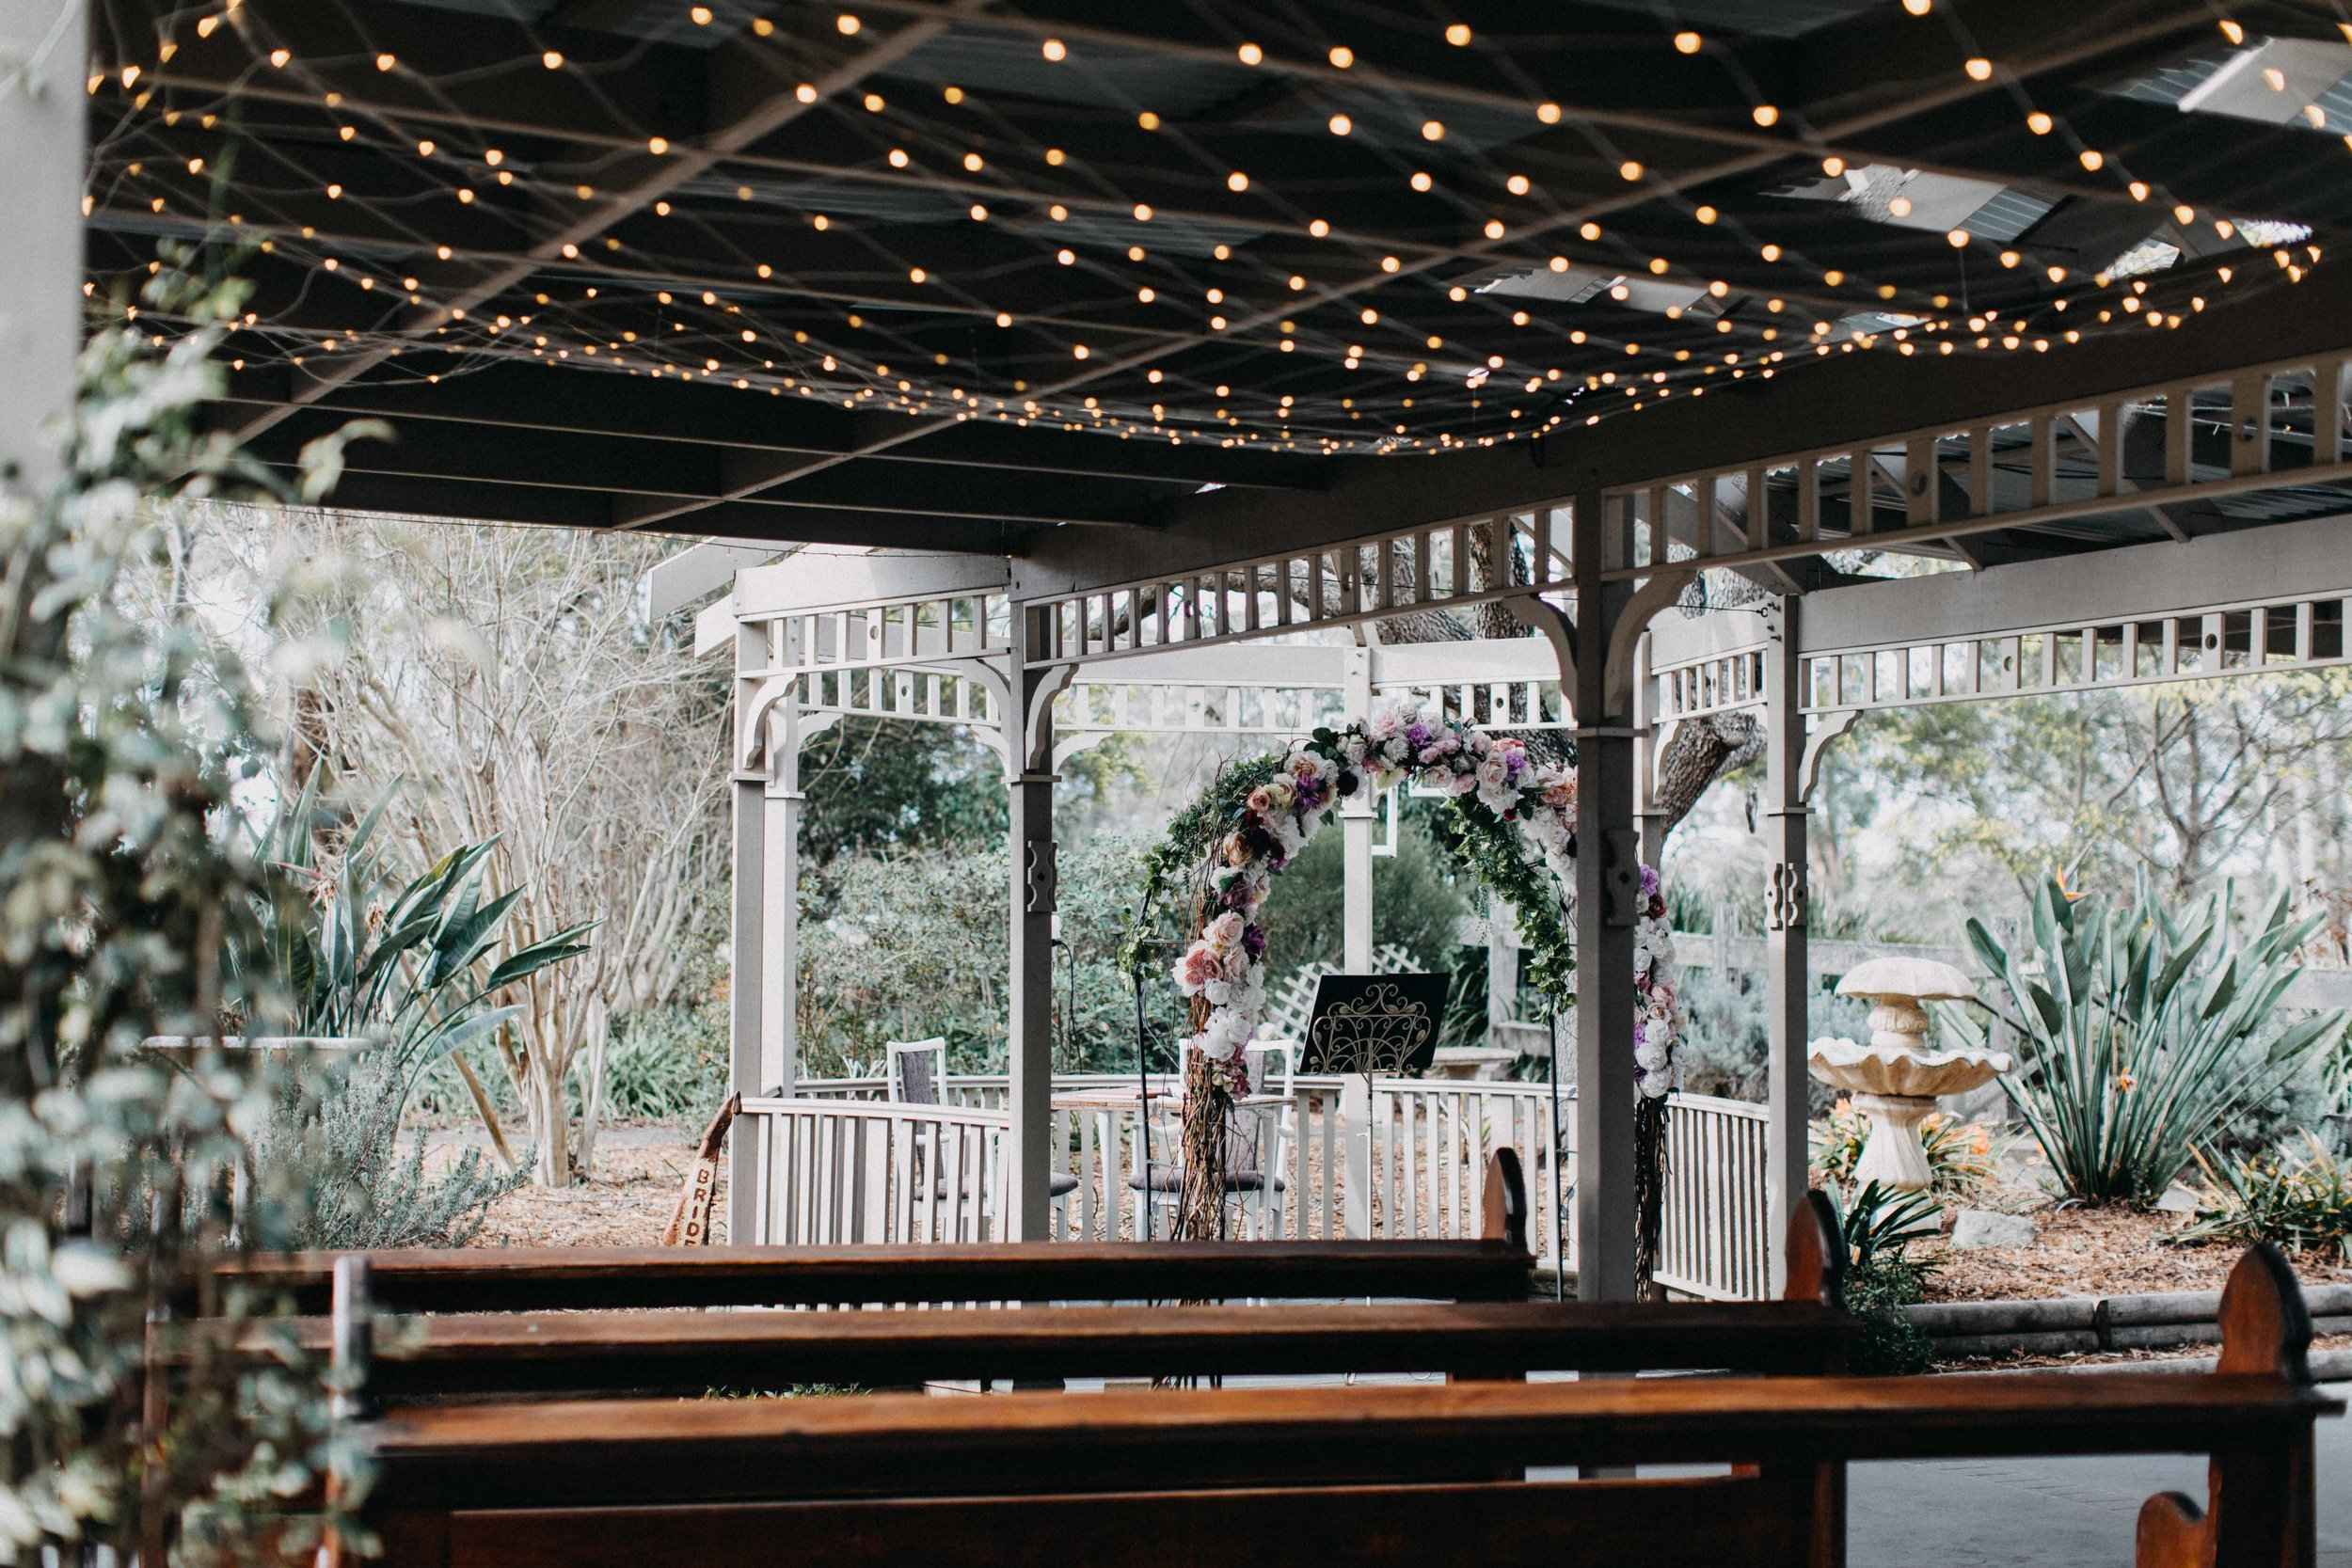 appin-house-wedding-macarthur-www.emilyobrienphotography.net-50.jpg